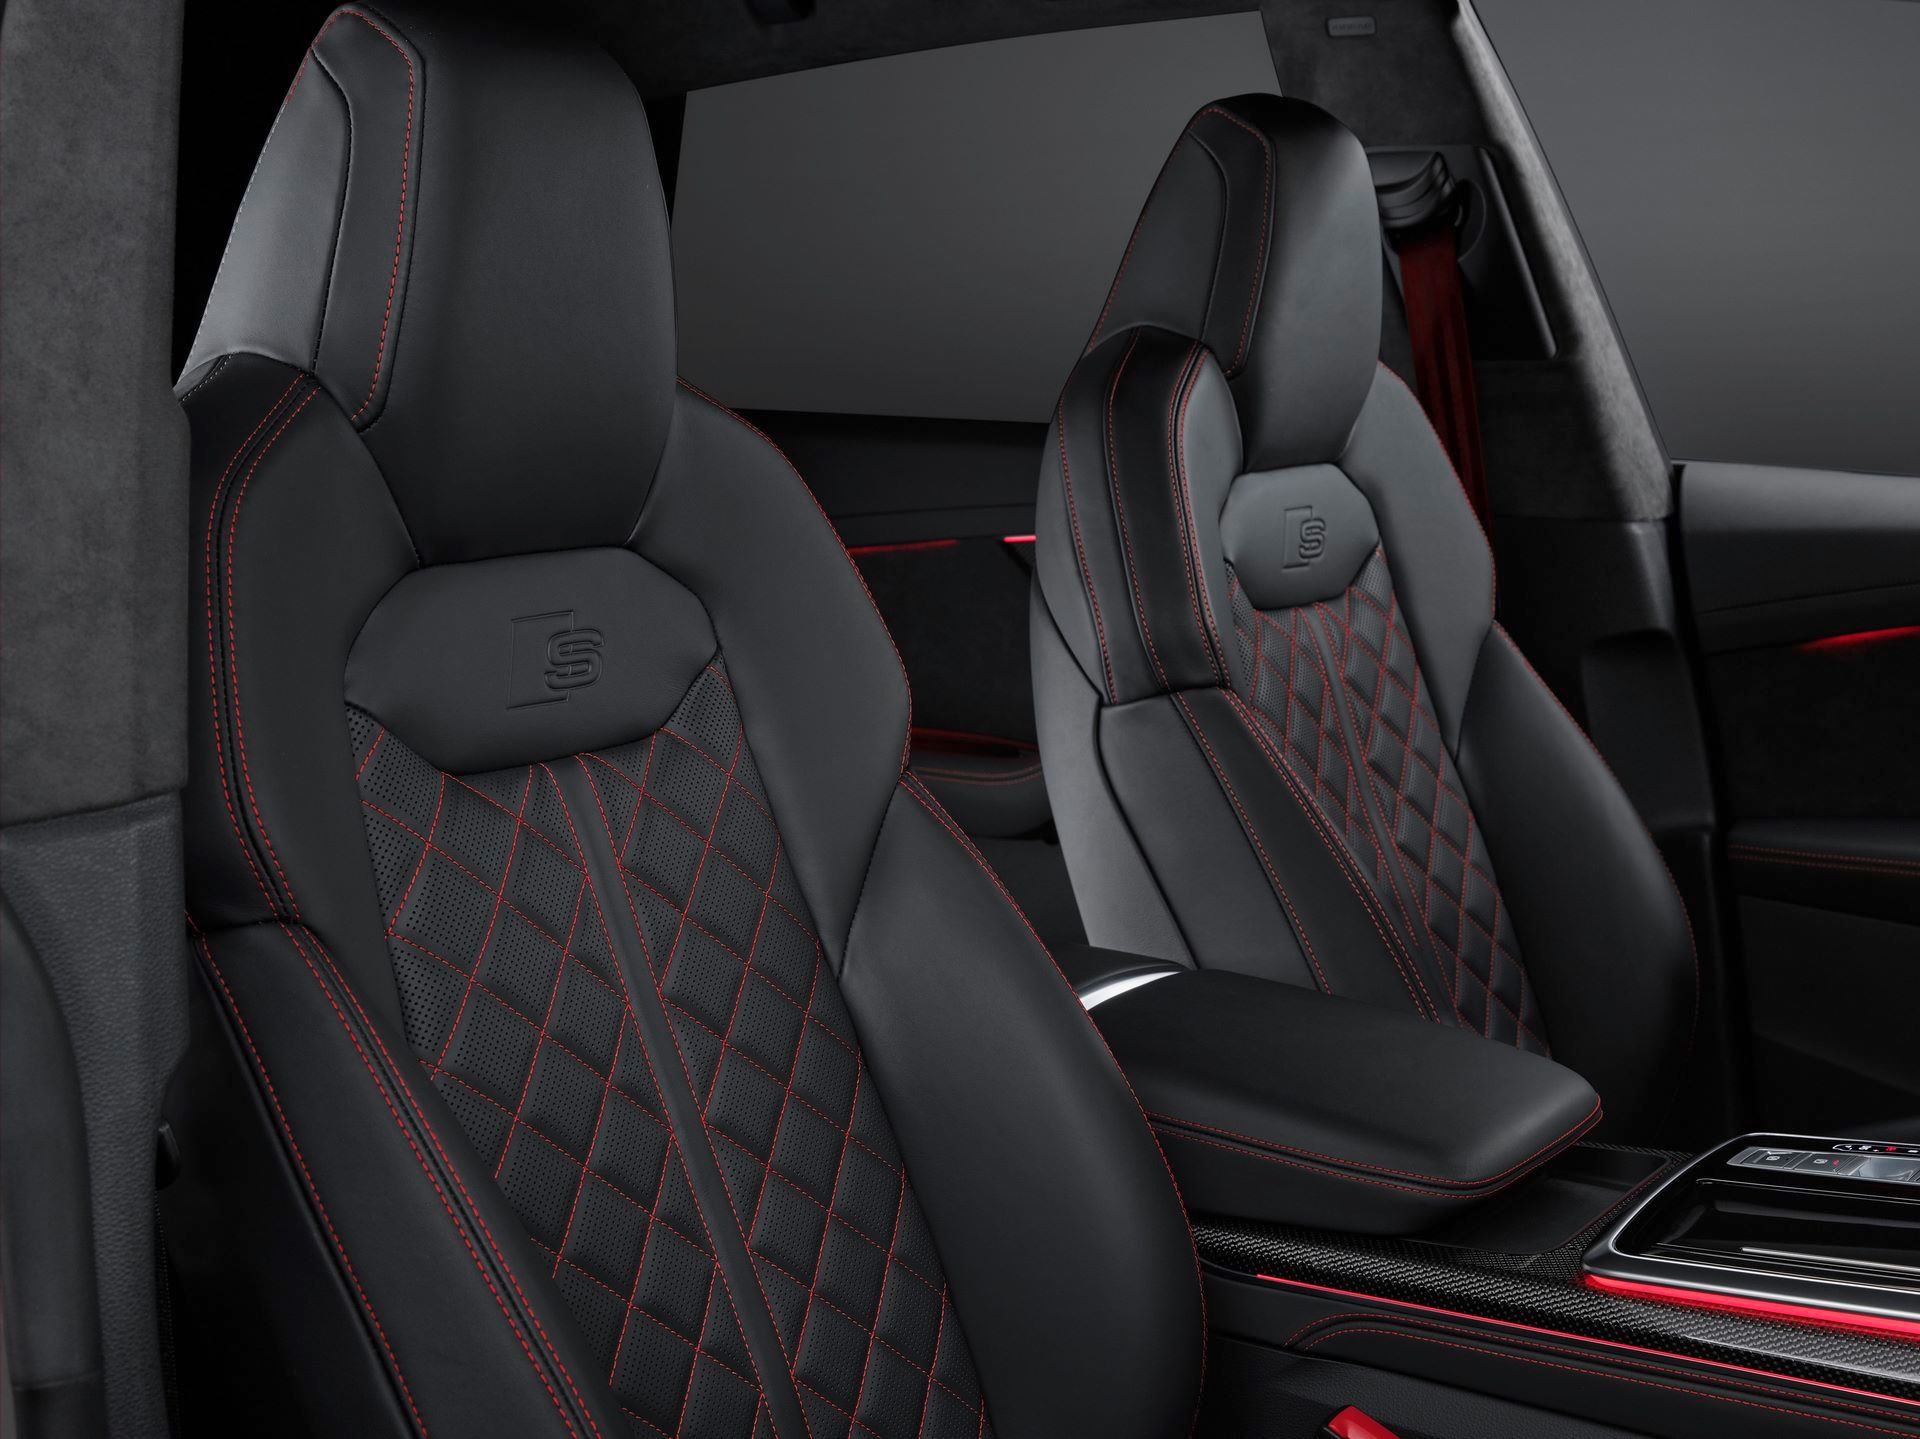 Audi-A4-A5-Q7-Q8-Competition-And-Competition-Plus-Trims-31